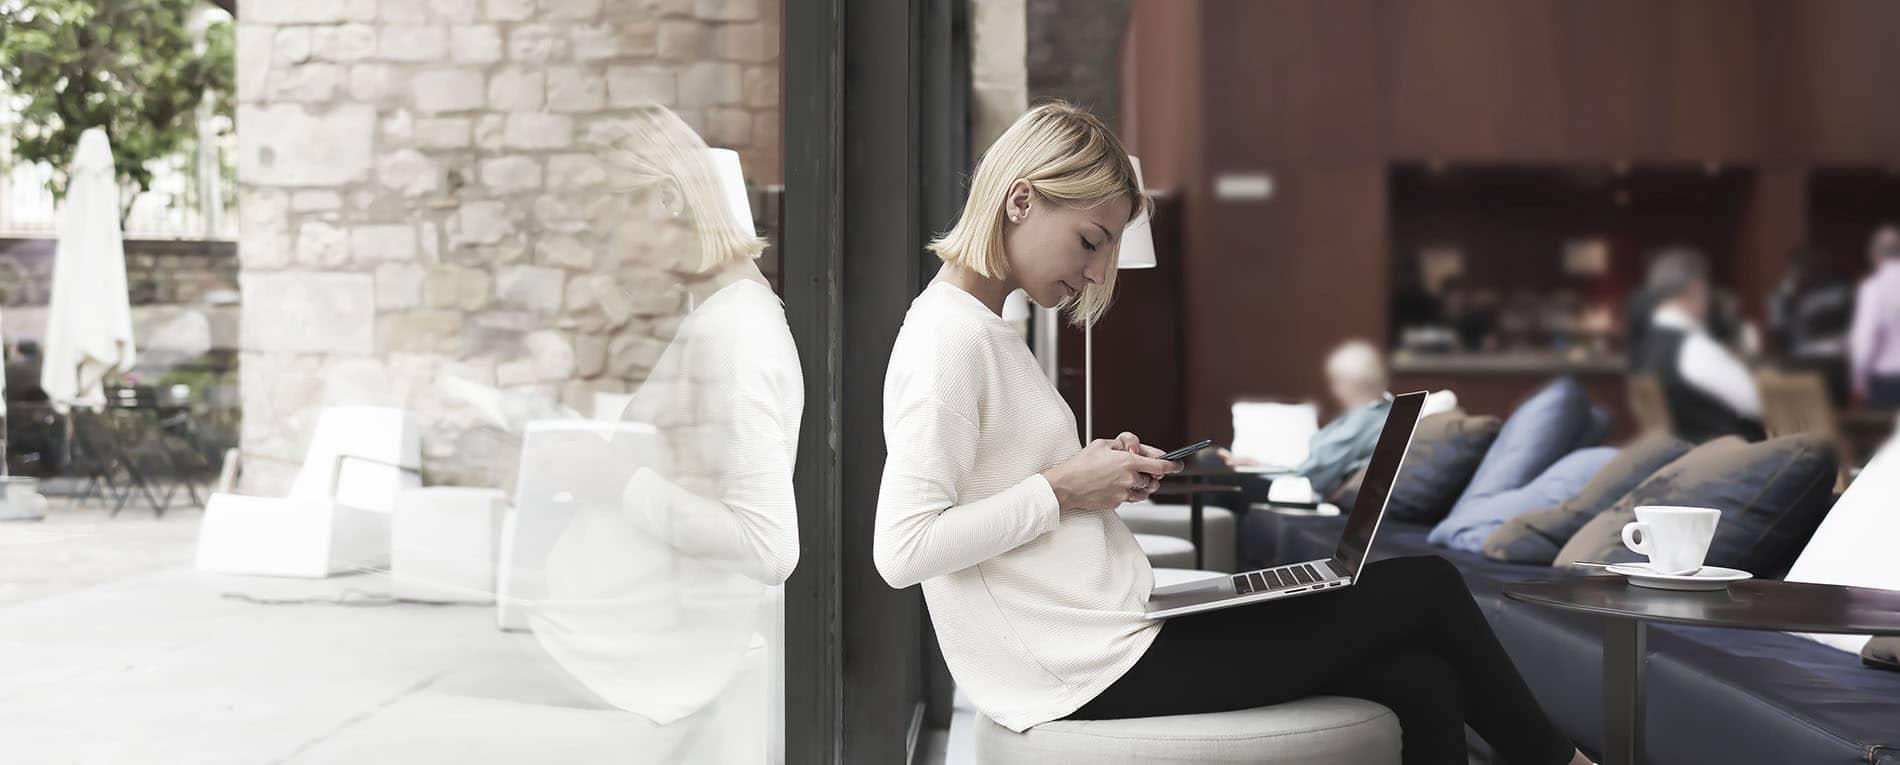 Webbintegration Visma Business | E-handel | Webshop